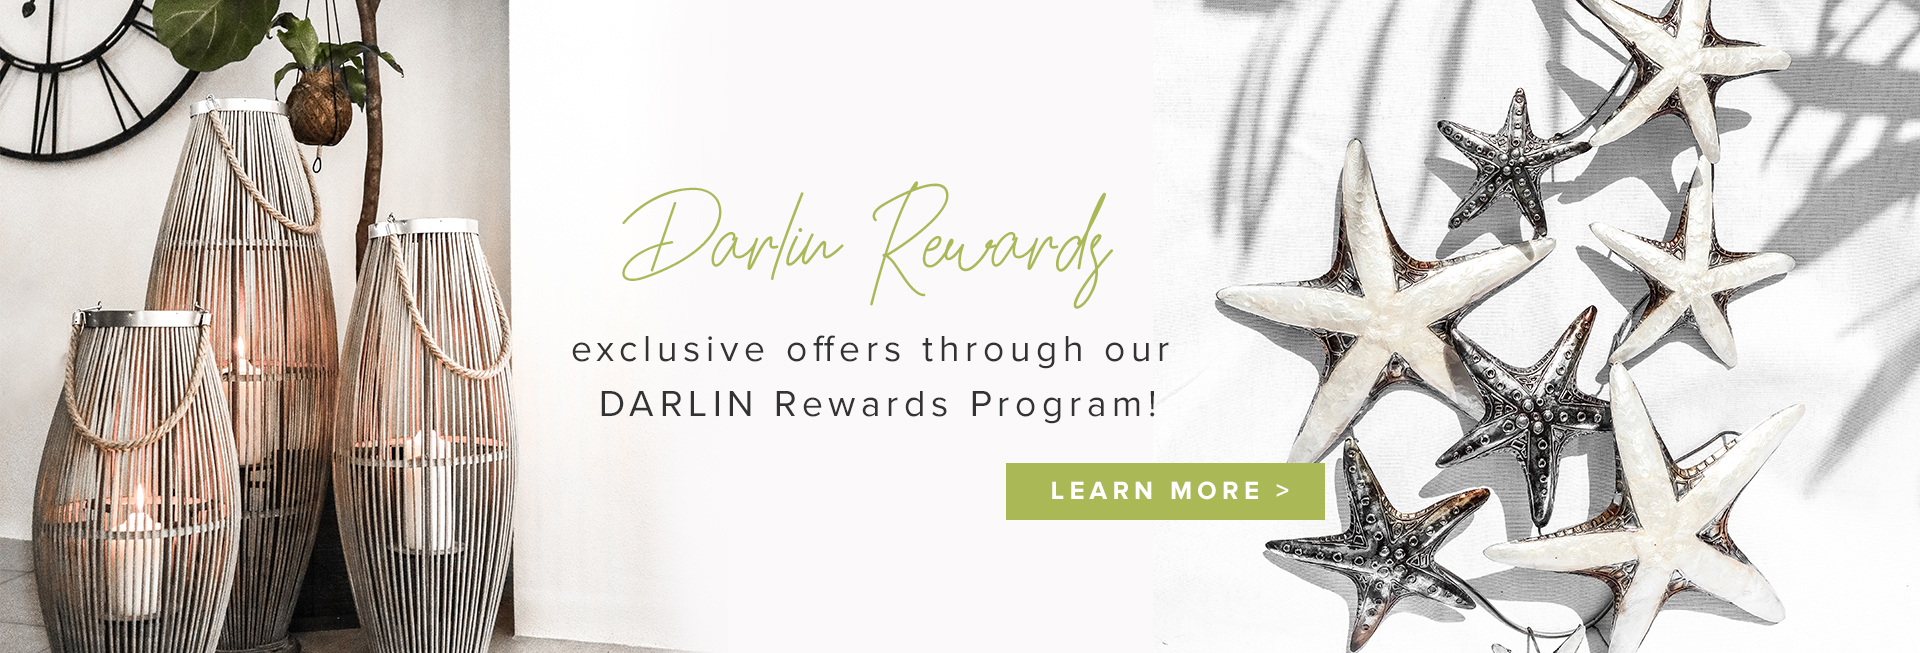 Darlin Rewards Program Details